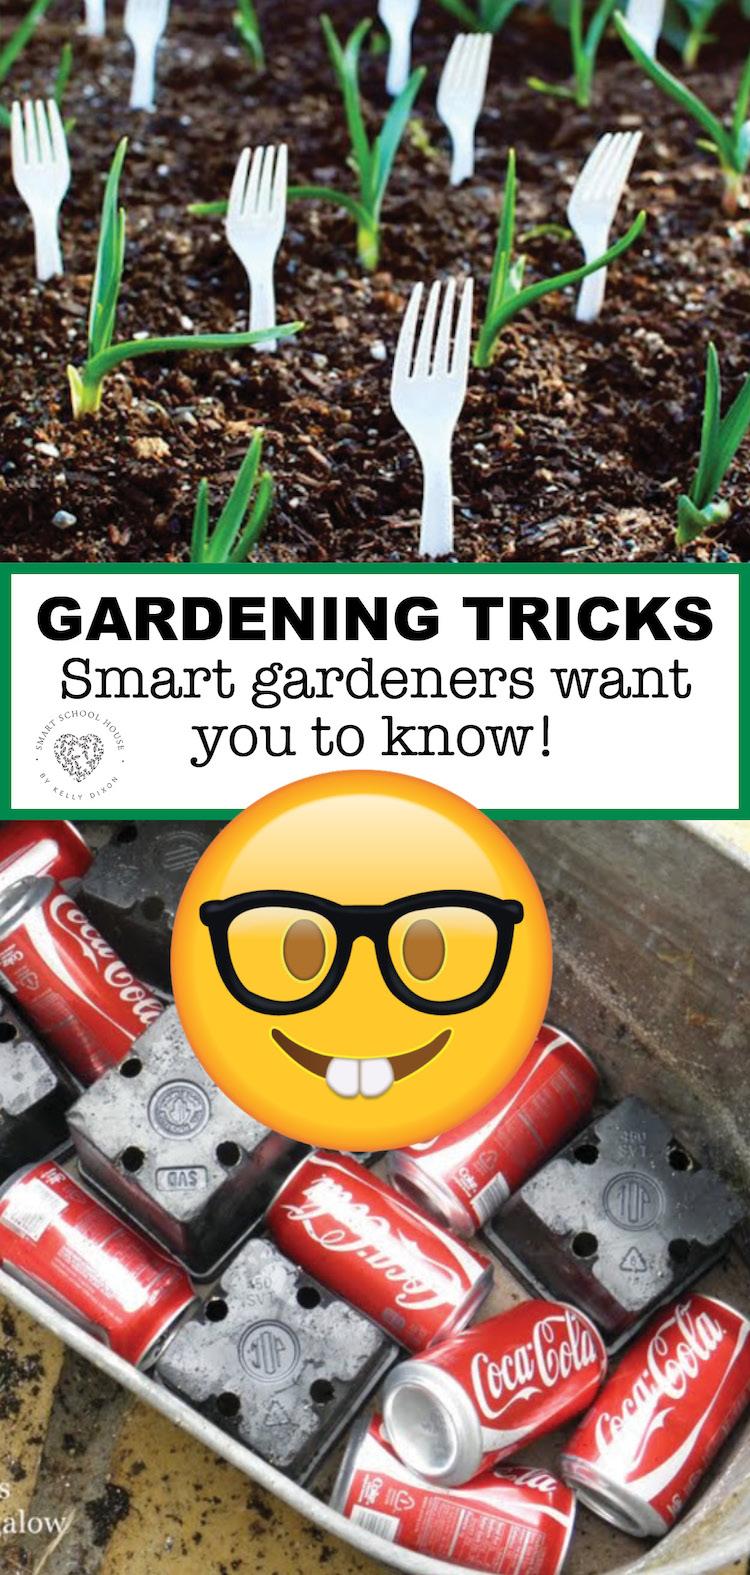 Gardening Tricks that smart gardeners want you to know! #Gardening #GardeningHacks